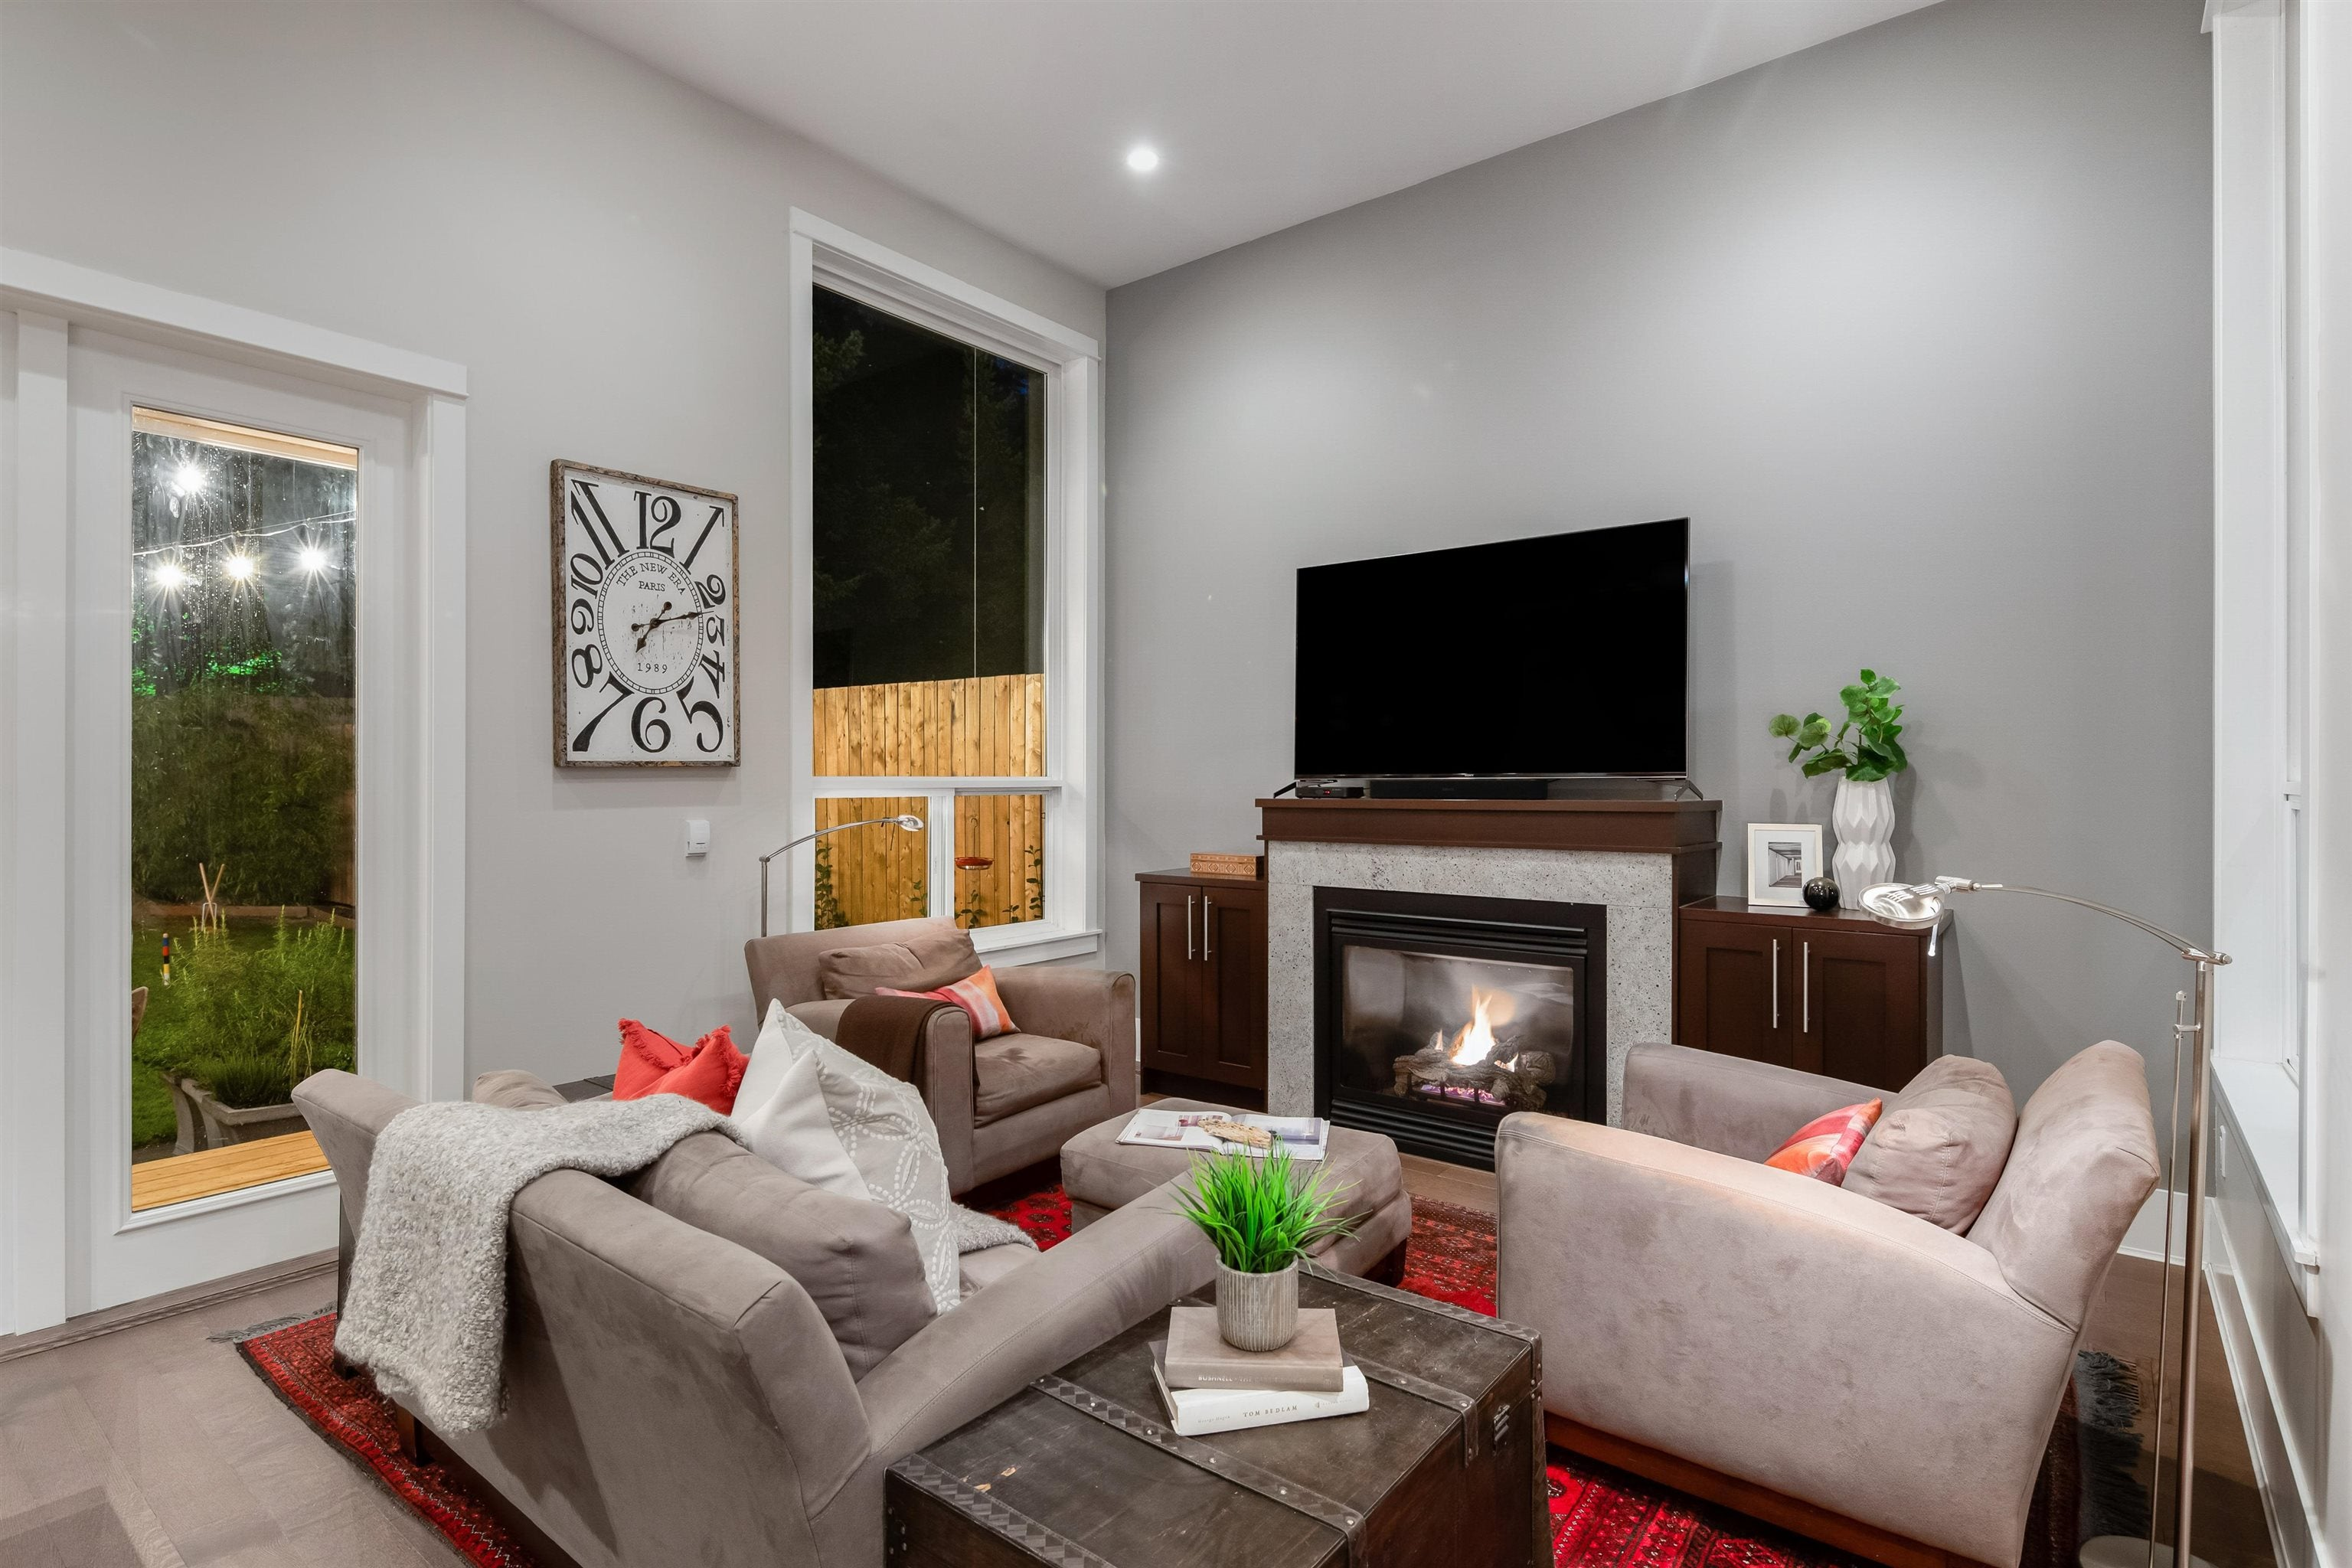 2258 WINDRIDGE DRIVE - Seymour NV House/Single Family for sale, 5 Bedrooms (R2617156) - #11